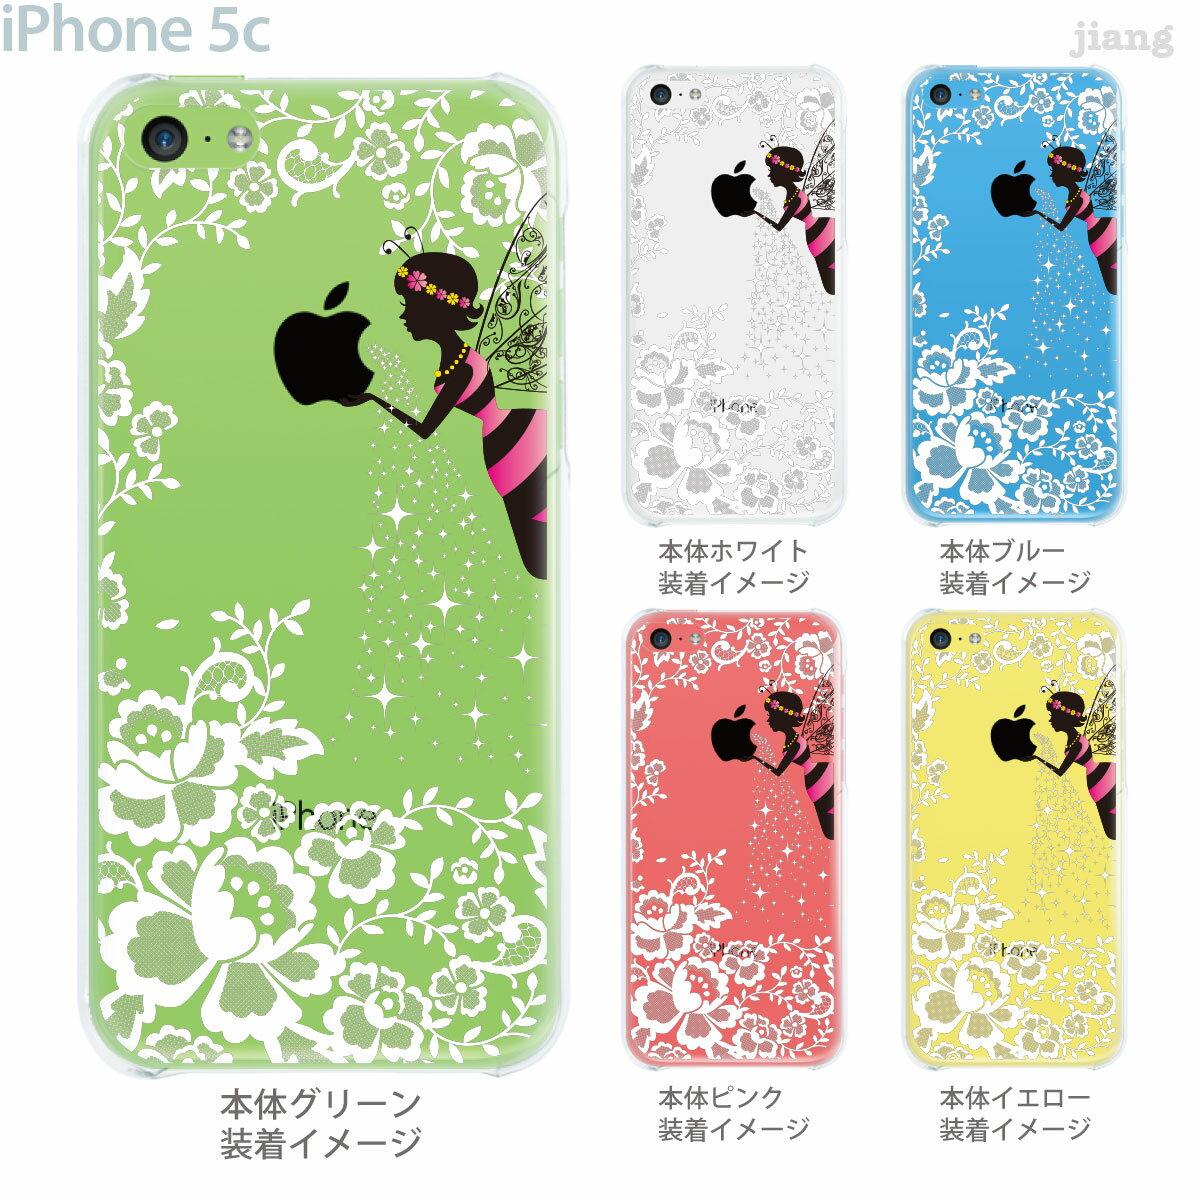 【iPhone5c】【iPhone5c ケース】【iPhone5c カバー】【ケース】【カバー】【スマホケース】【クリアケース】【クリアーアーツ】【Clear Arts】【りんごと妖精】 01-ip5c-zec024